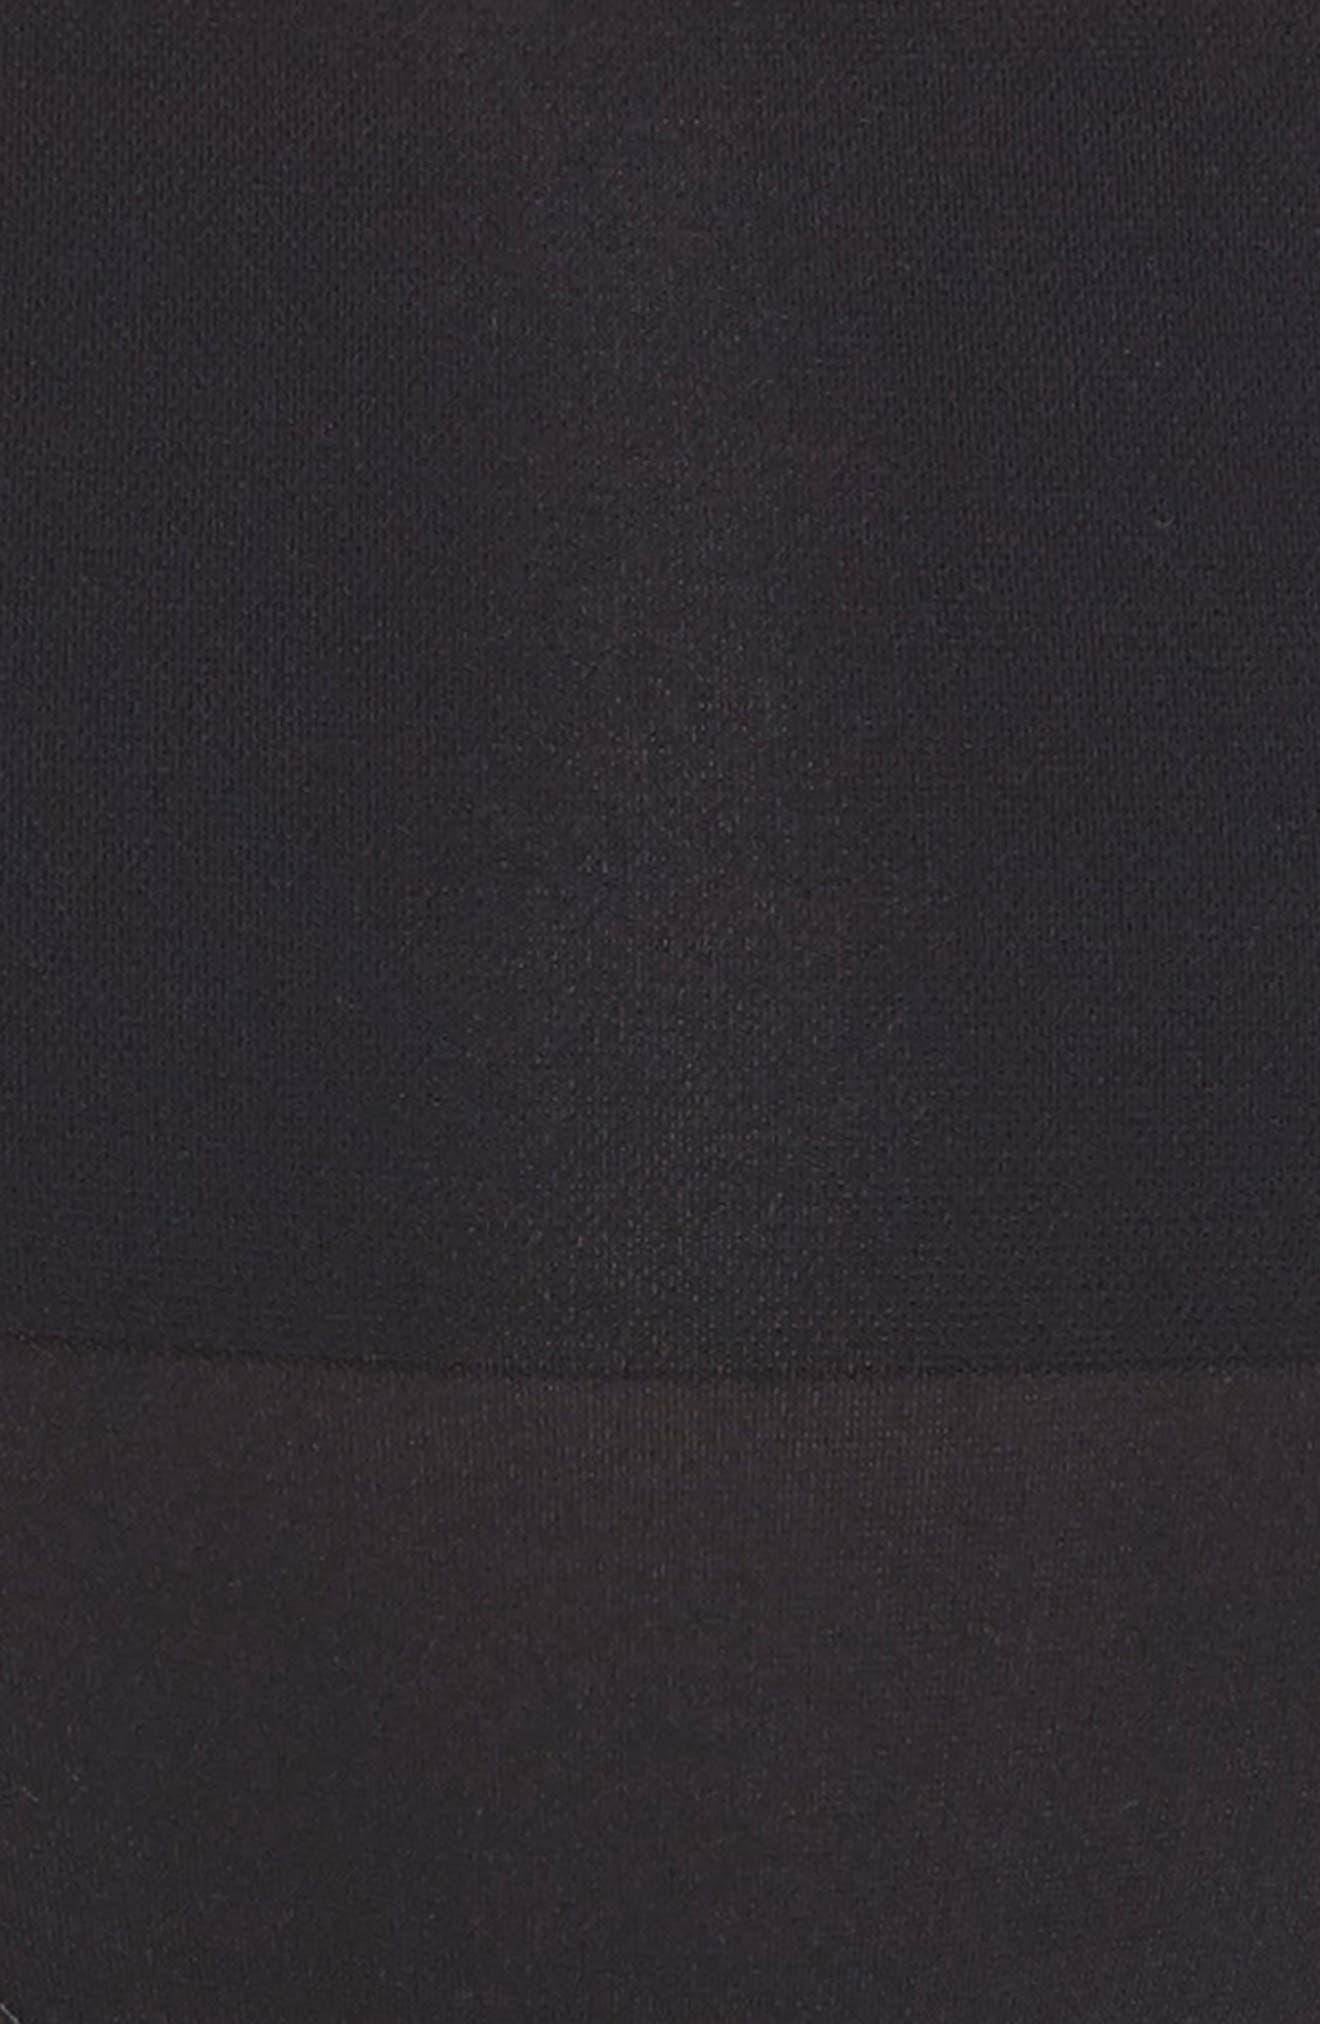 Ultralight Seamless Shaping Briefs,                             Alternate thumbnail 4, color,                             BLACK